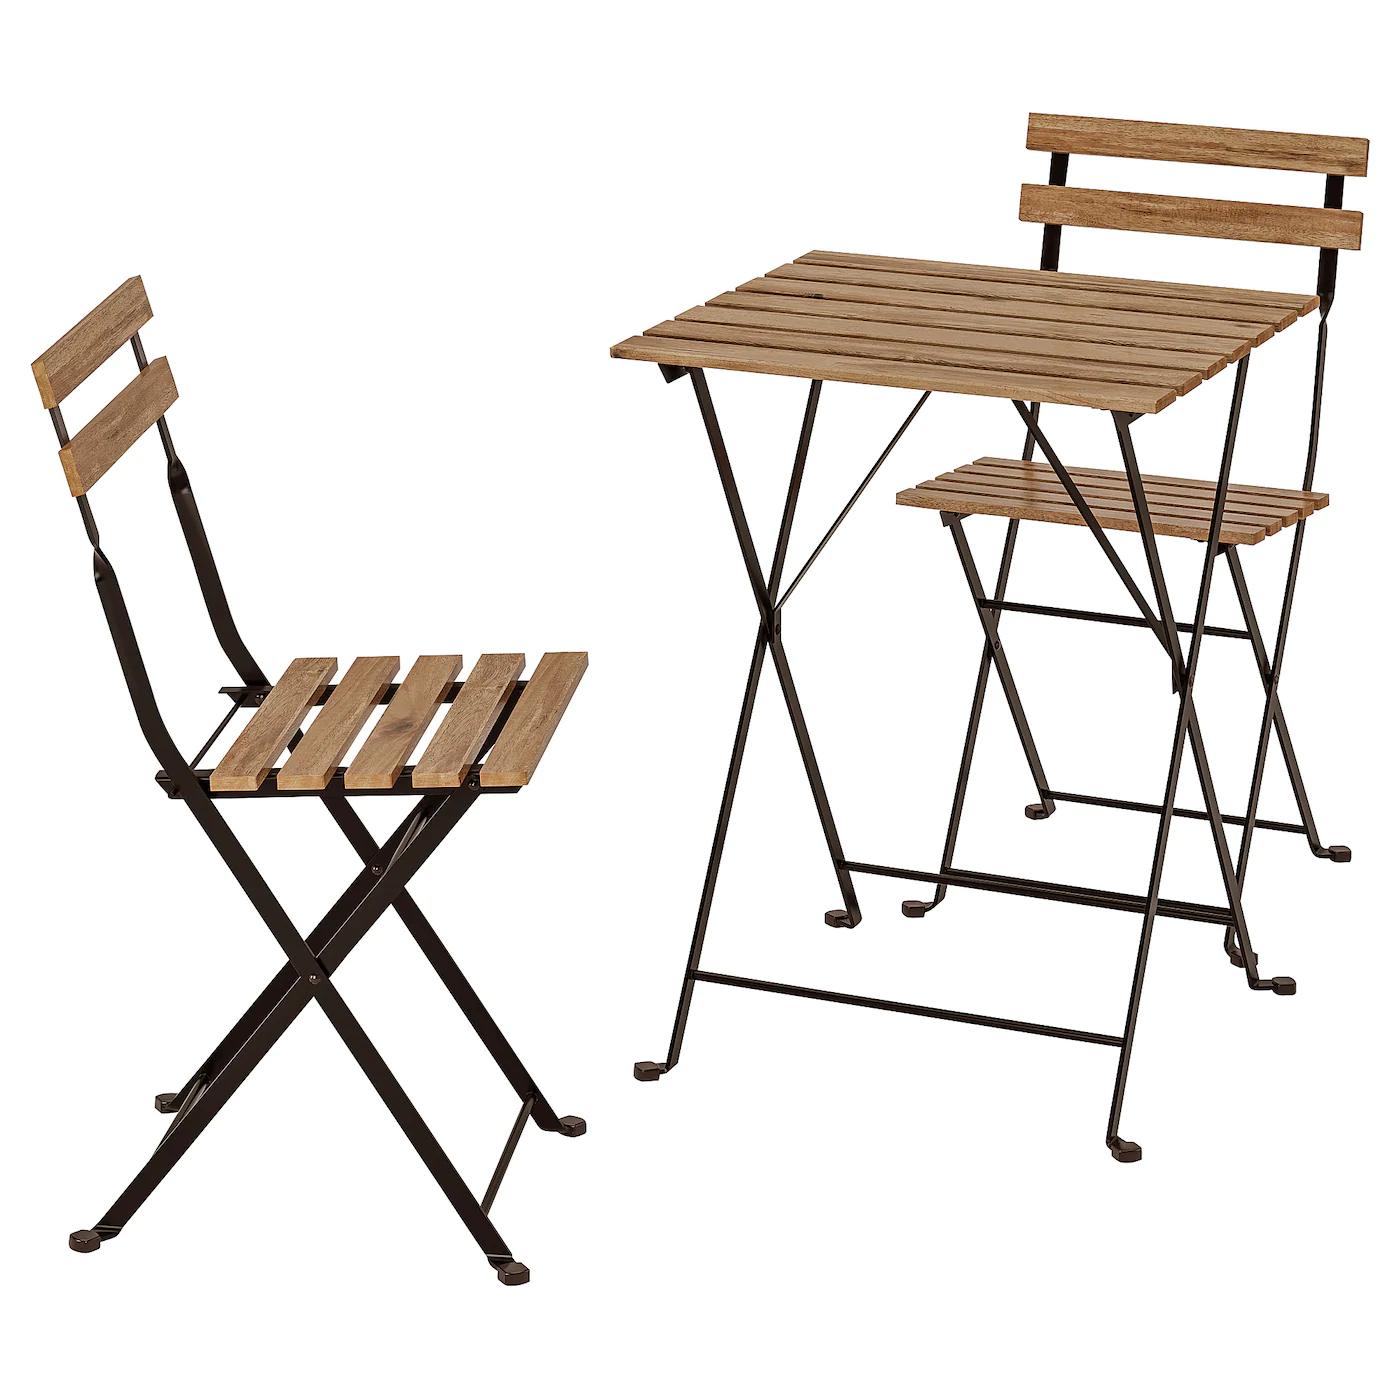 Ikea Family Members - 20% off various garden products instore - e.g TÄRNÖ Table & 2 Chairs £28 / ÄPPLARÖ - Bench £36